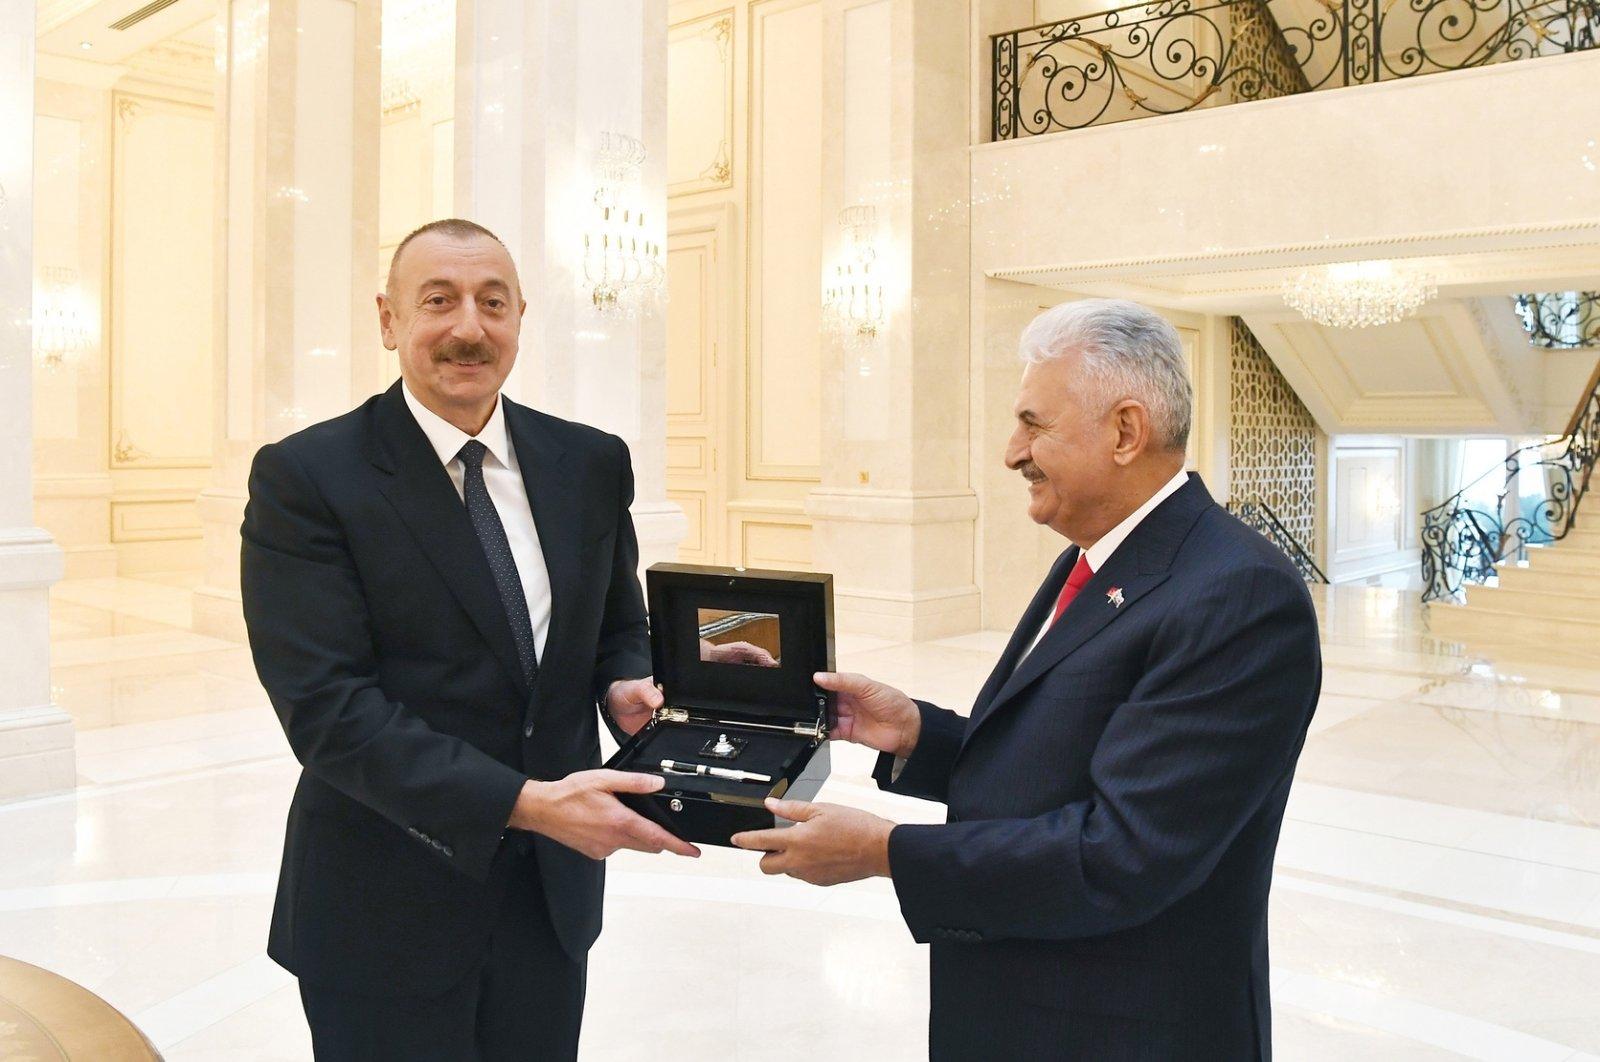 Azerbaijan's President Ilham Aliyev presents a gift to the ruling Justice and Development Party's (AK Party) deputy Binali Yıldırım in the capital Baku, Nov. 2, 2020. (AA Photo)